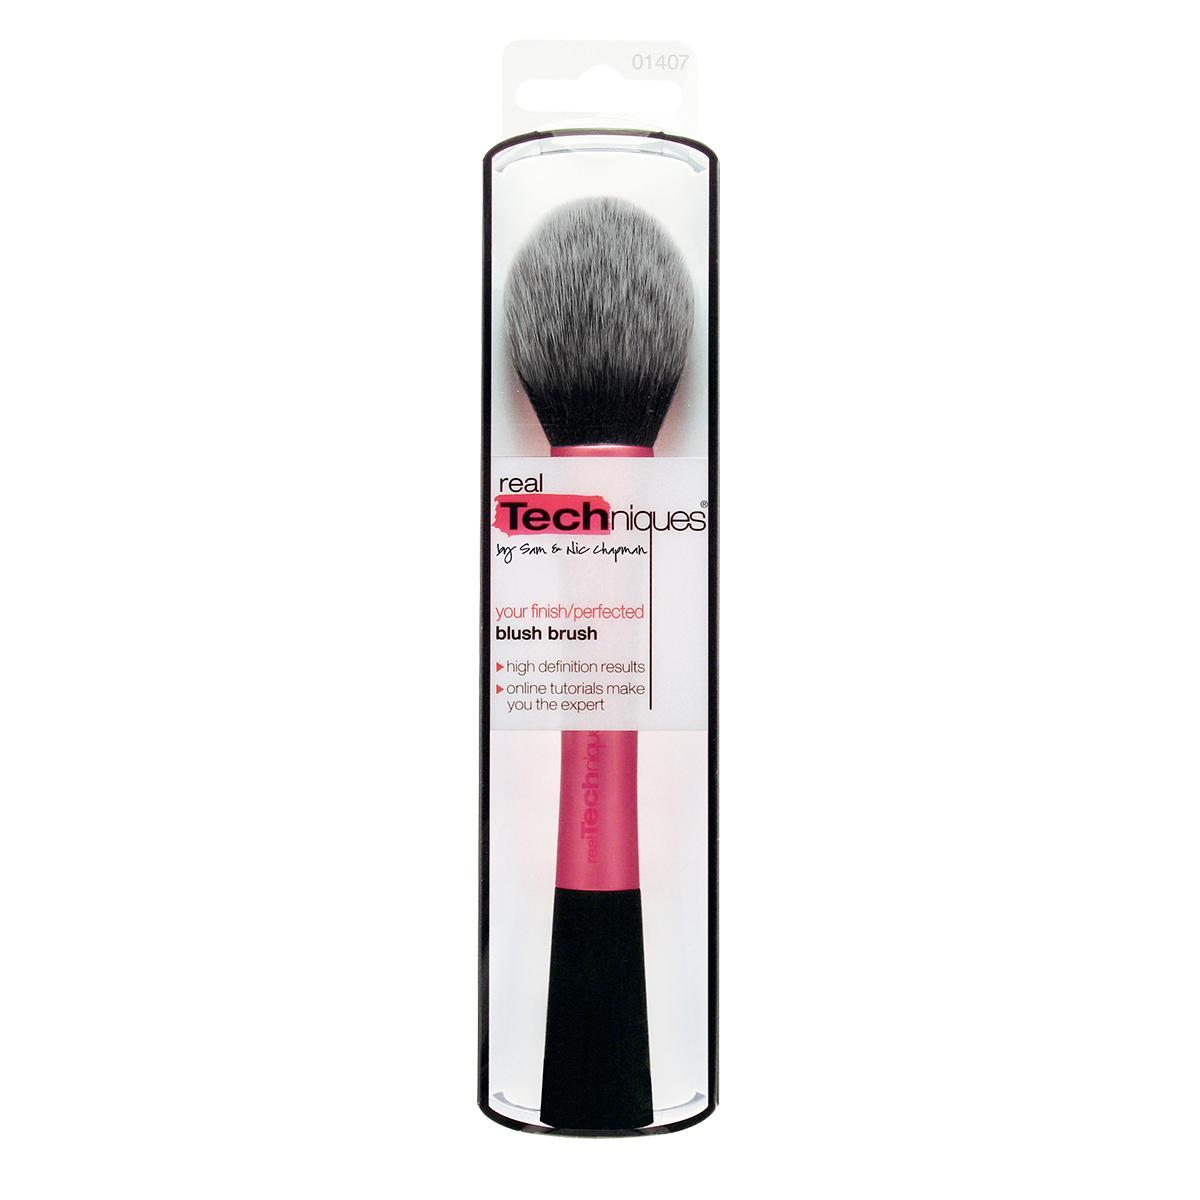 Real Techniques - 1407 Blush Brush